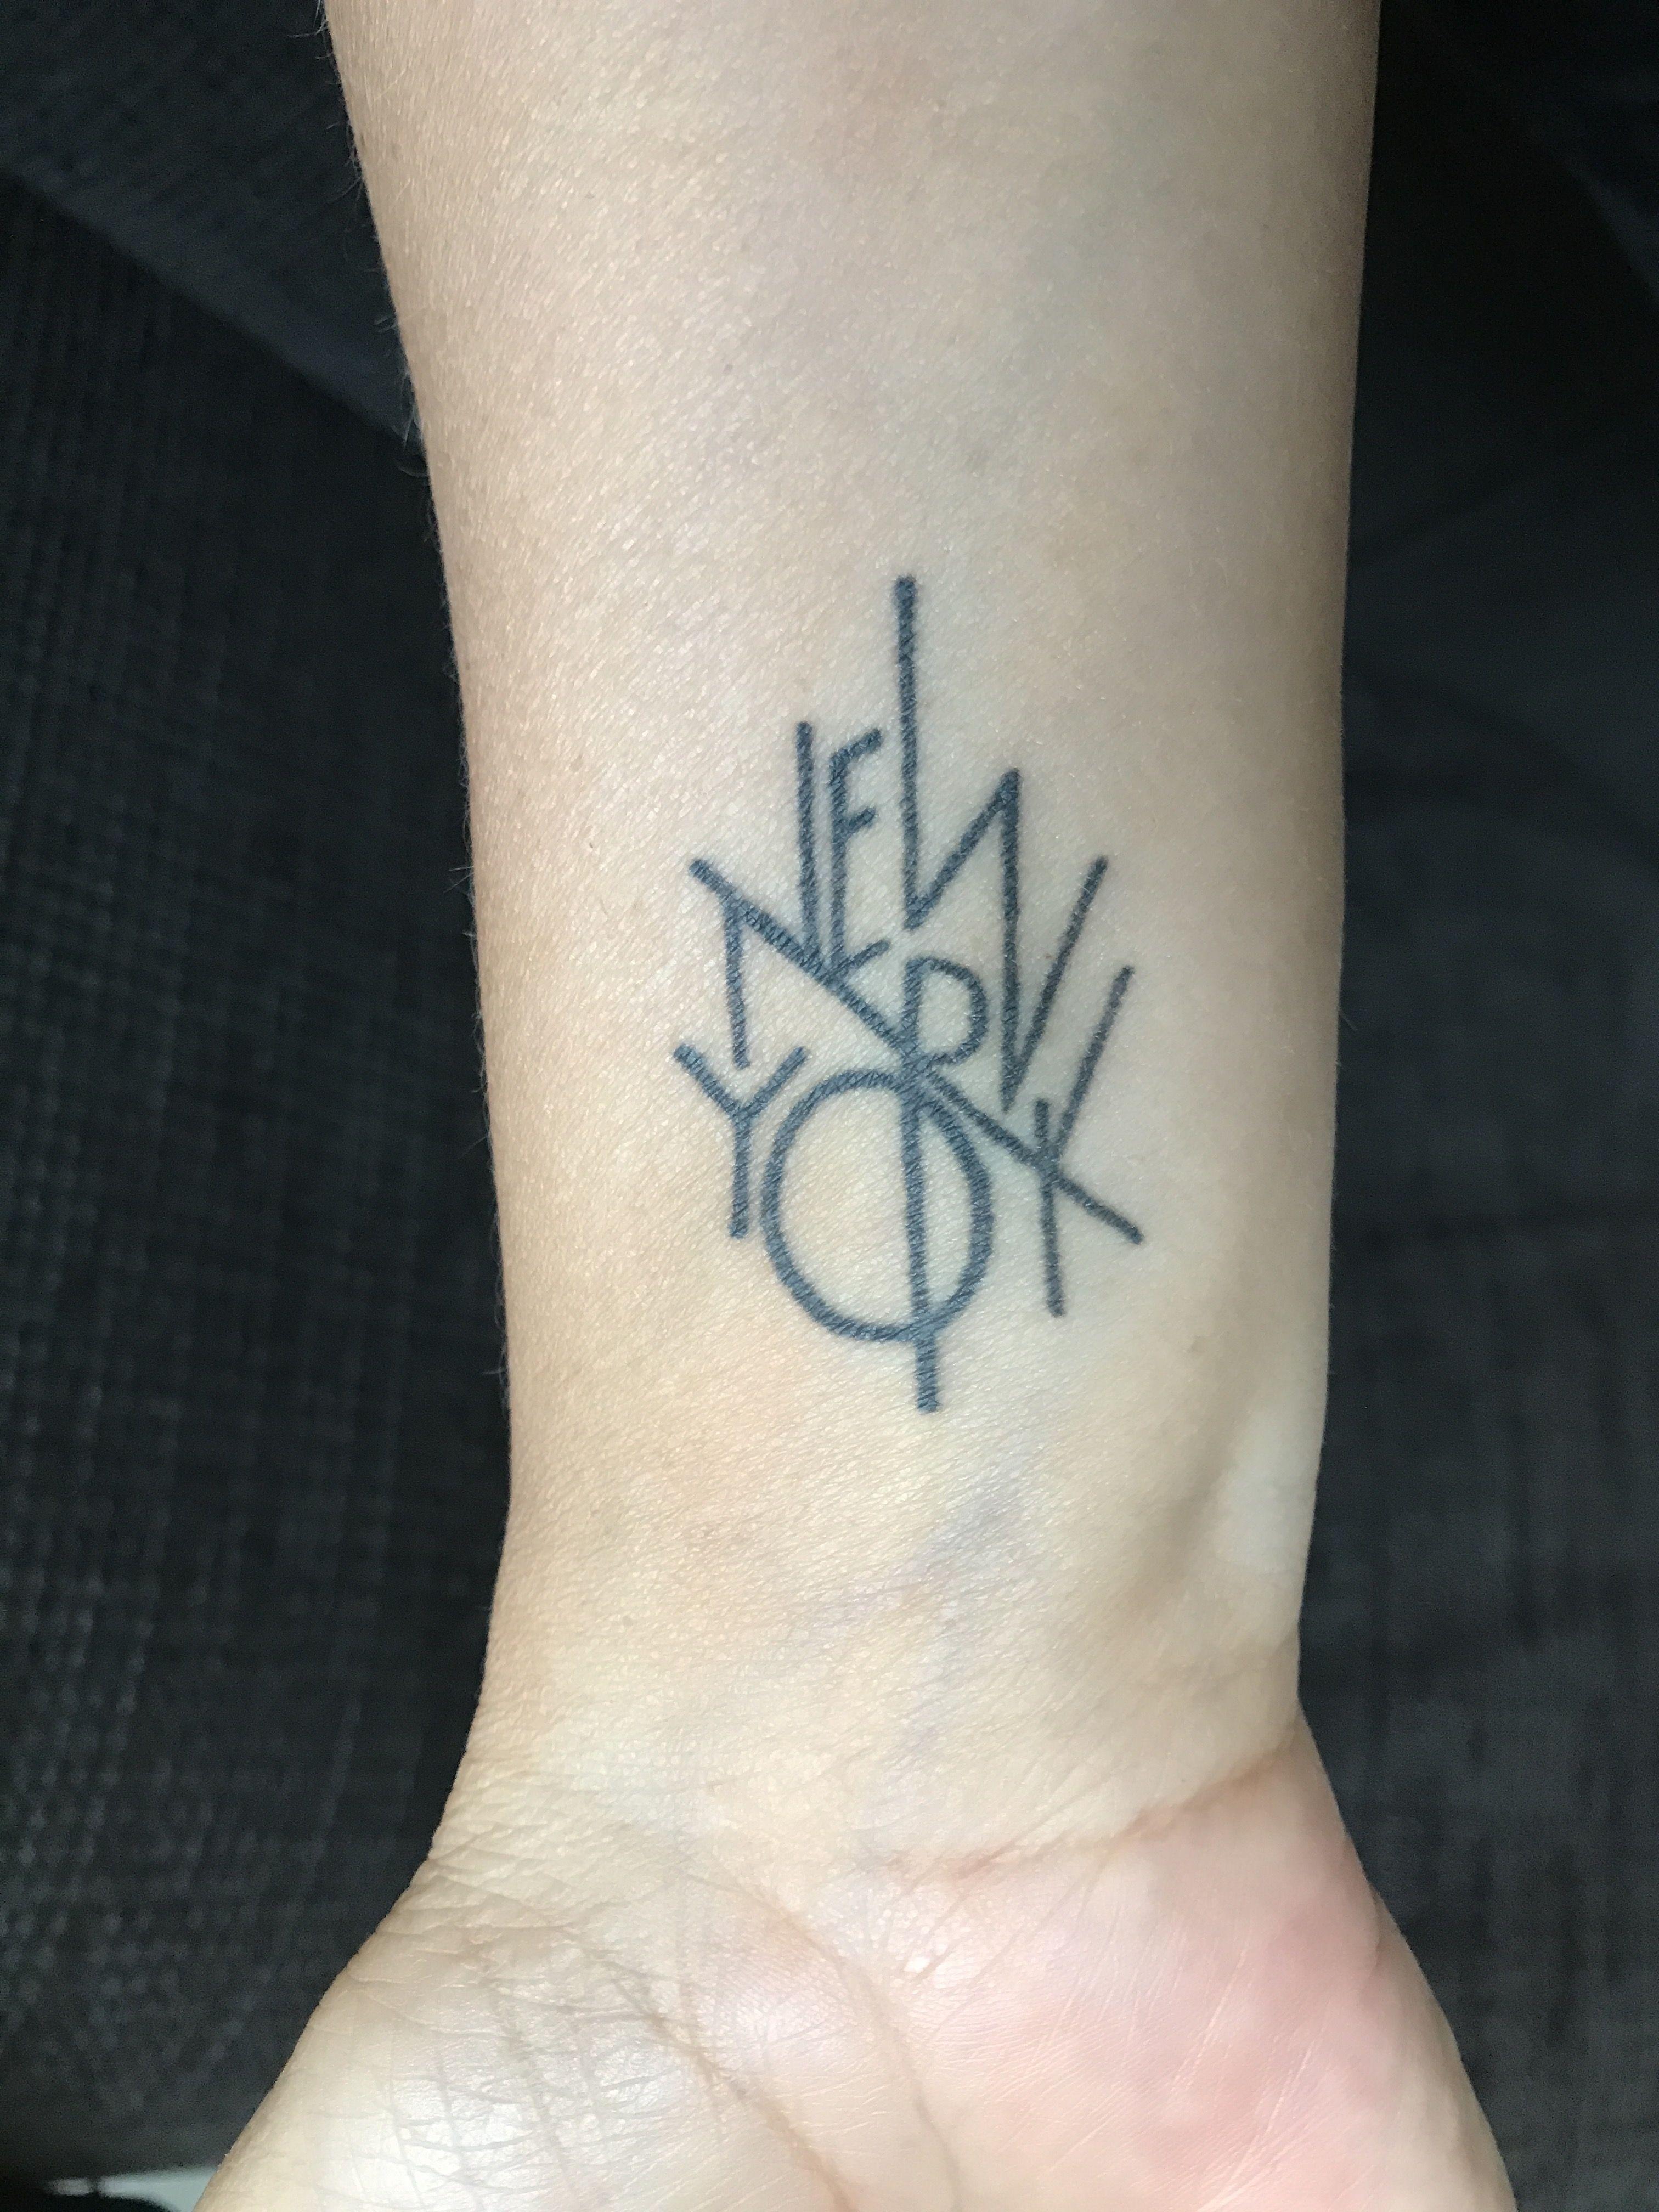 For The Love Of New York Tattoo Ideas Tattoos Nyc Tattoo